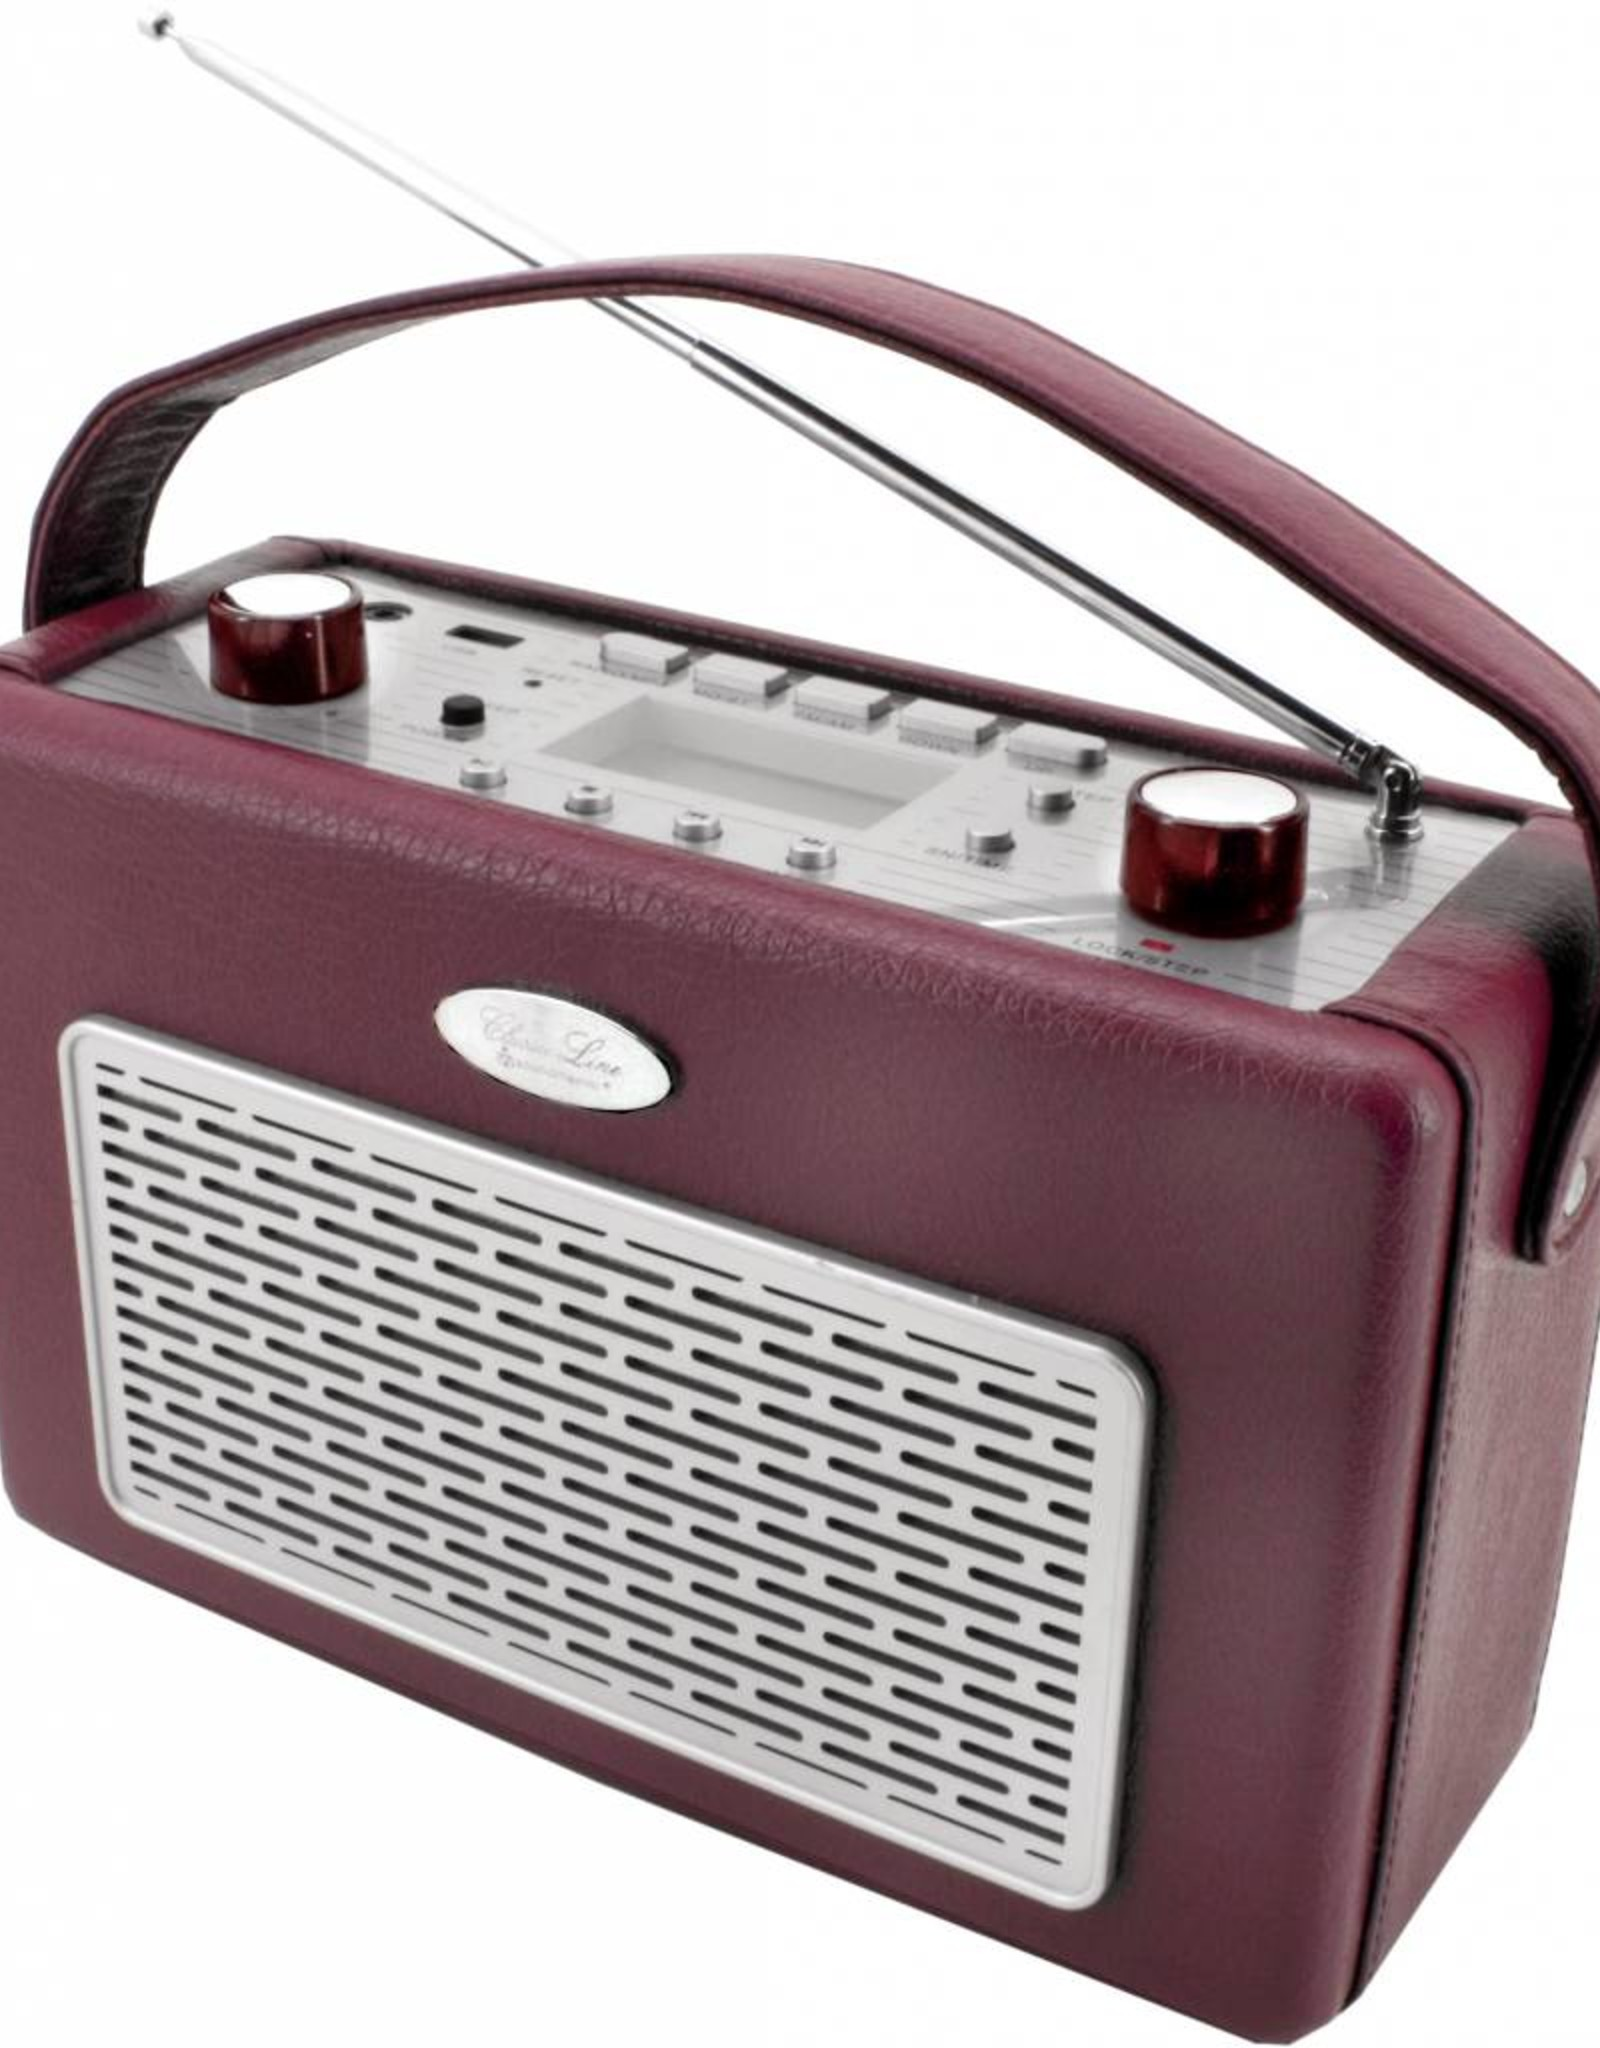 Soundmaster Nostalgische radio TR50 bordeauxrood